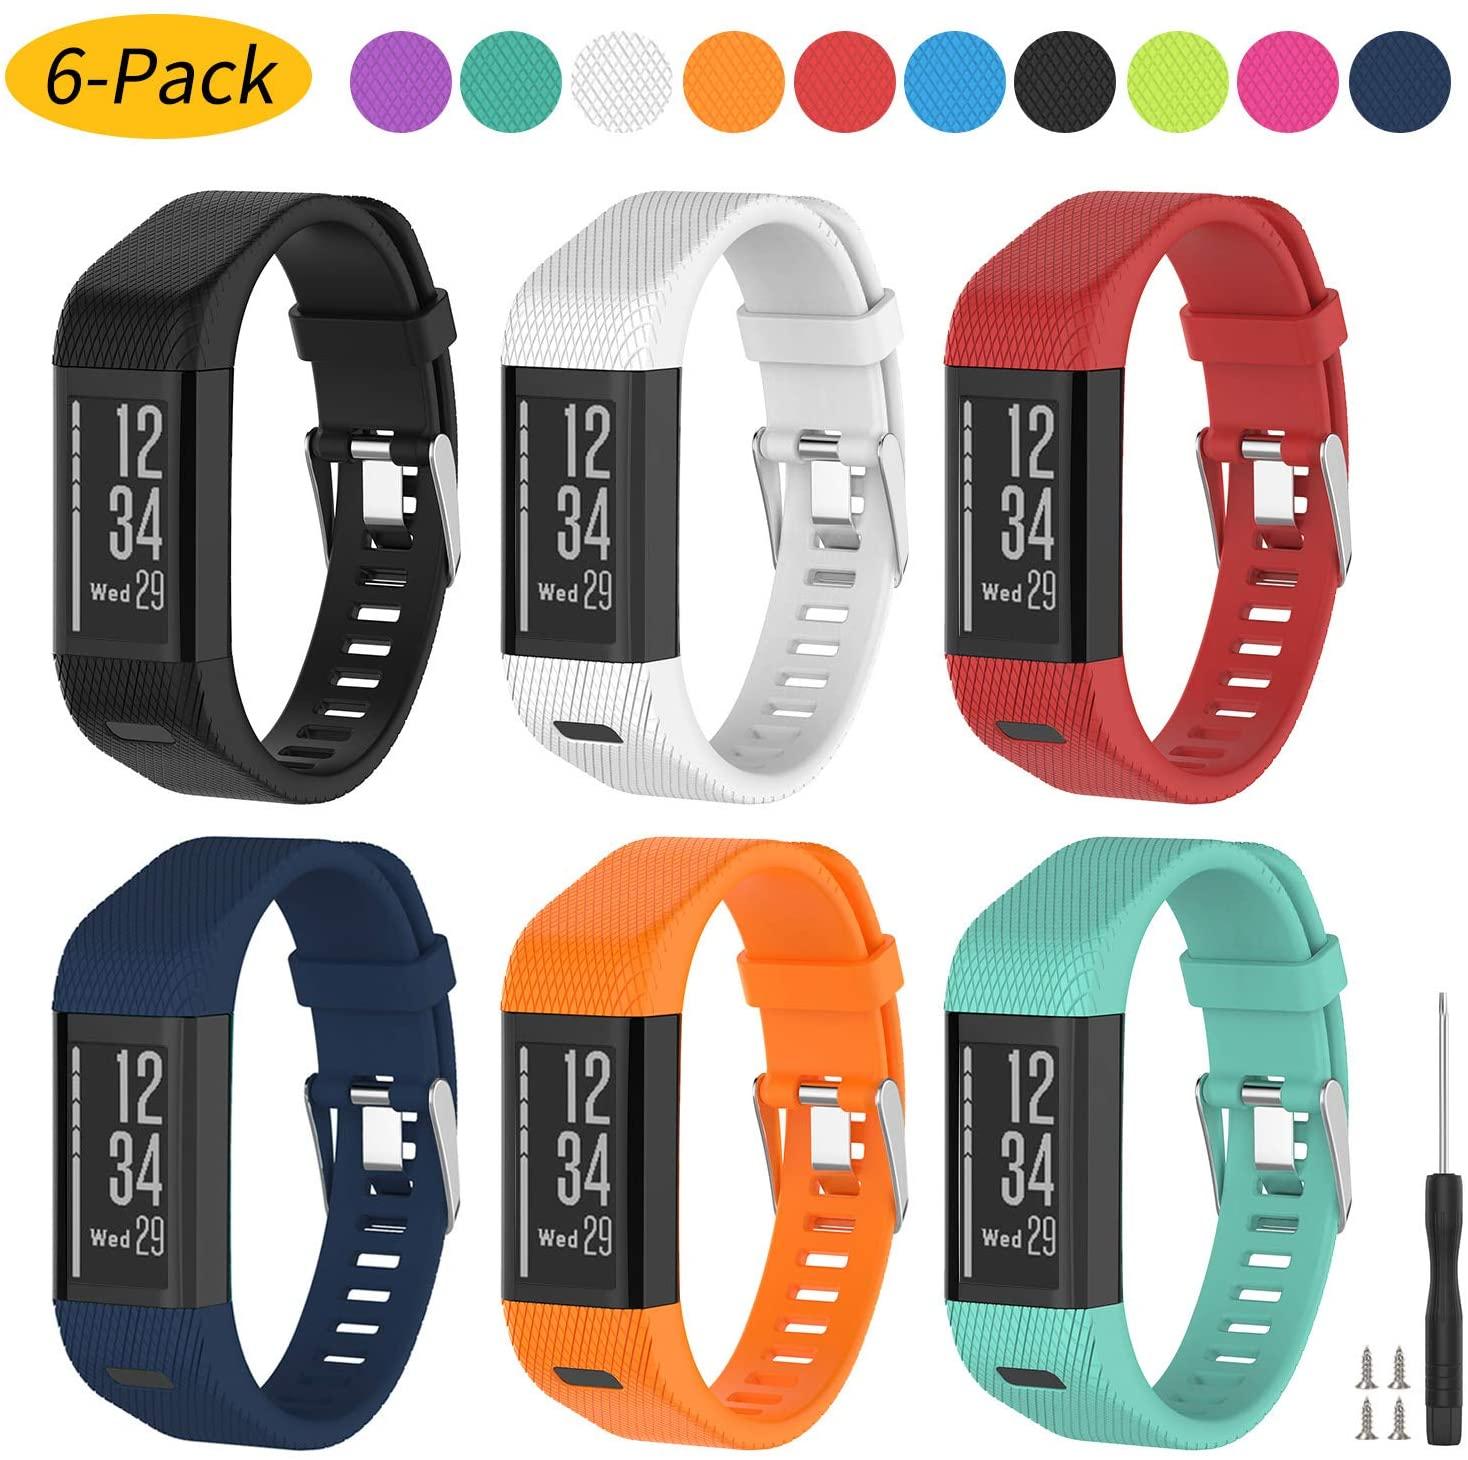 Vozehui Compatible with Garmin Vivosmart HR+ Watch Bands, Soft Silicone Replacement Wristband Accessories, Sport Wristband Strap for Garmin Vivosmart HR Plus (NOT for Vivosmart HR)